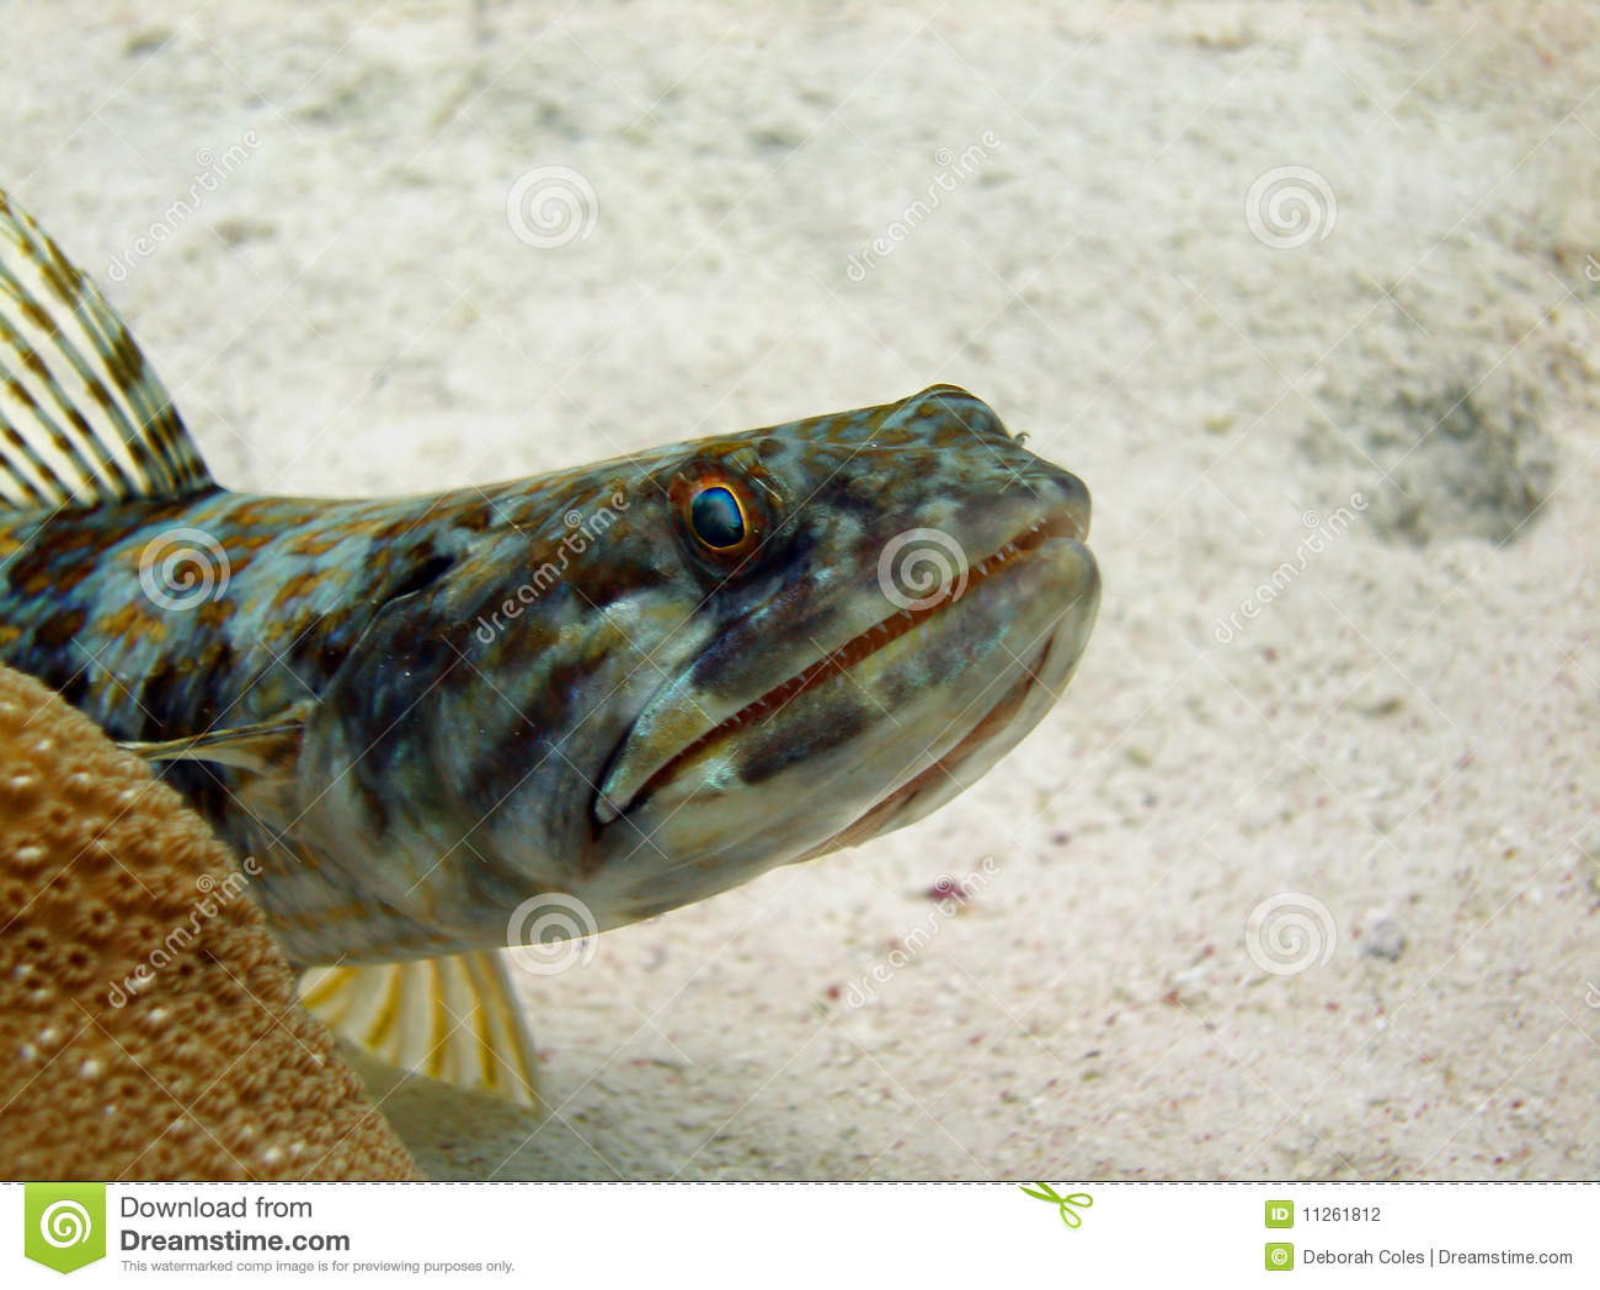 Lizard fish royalty free stock image for Water lizard fish